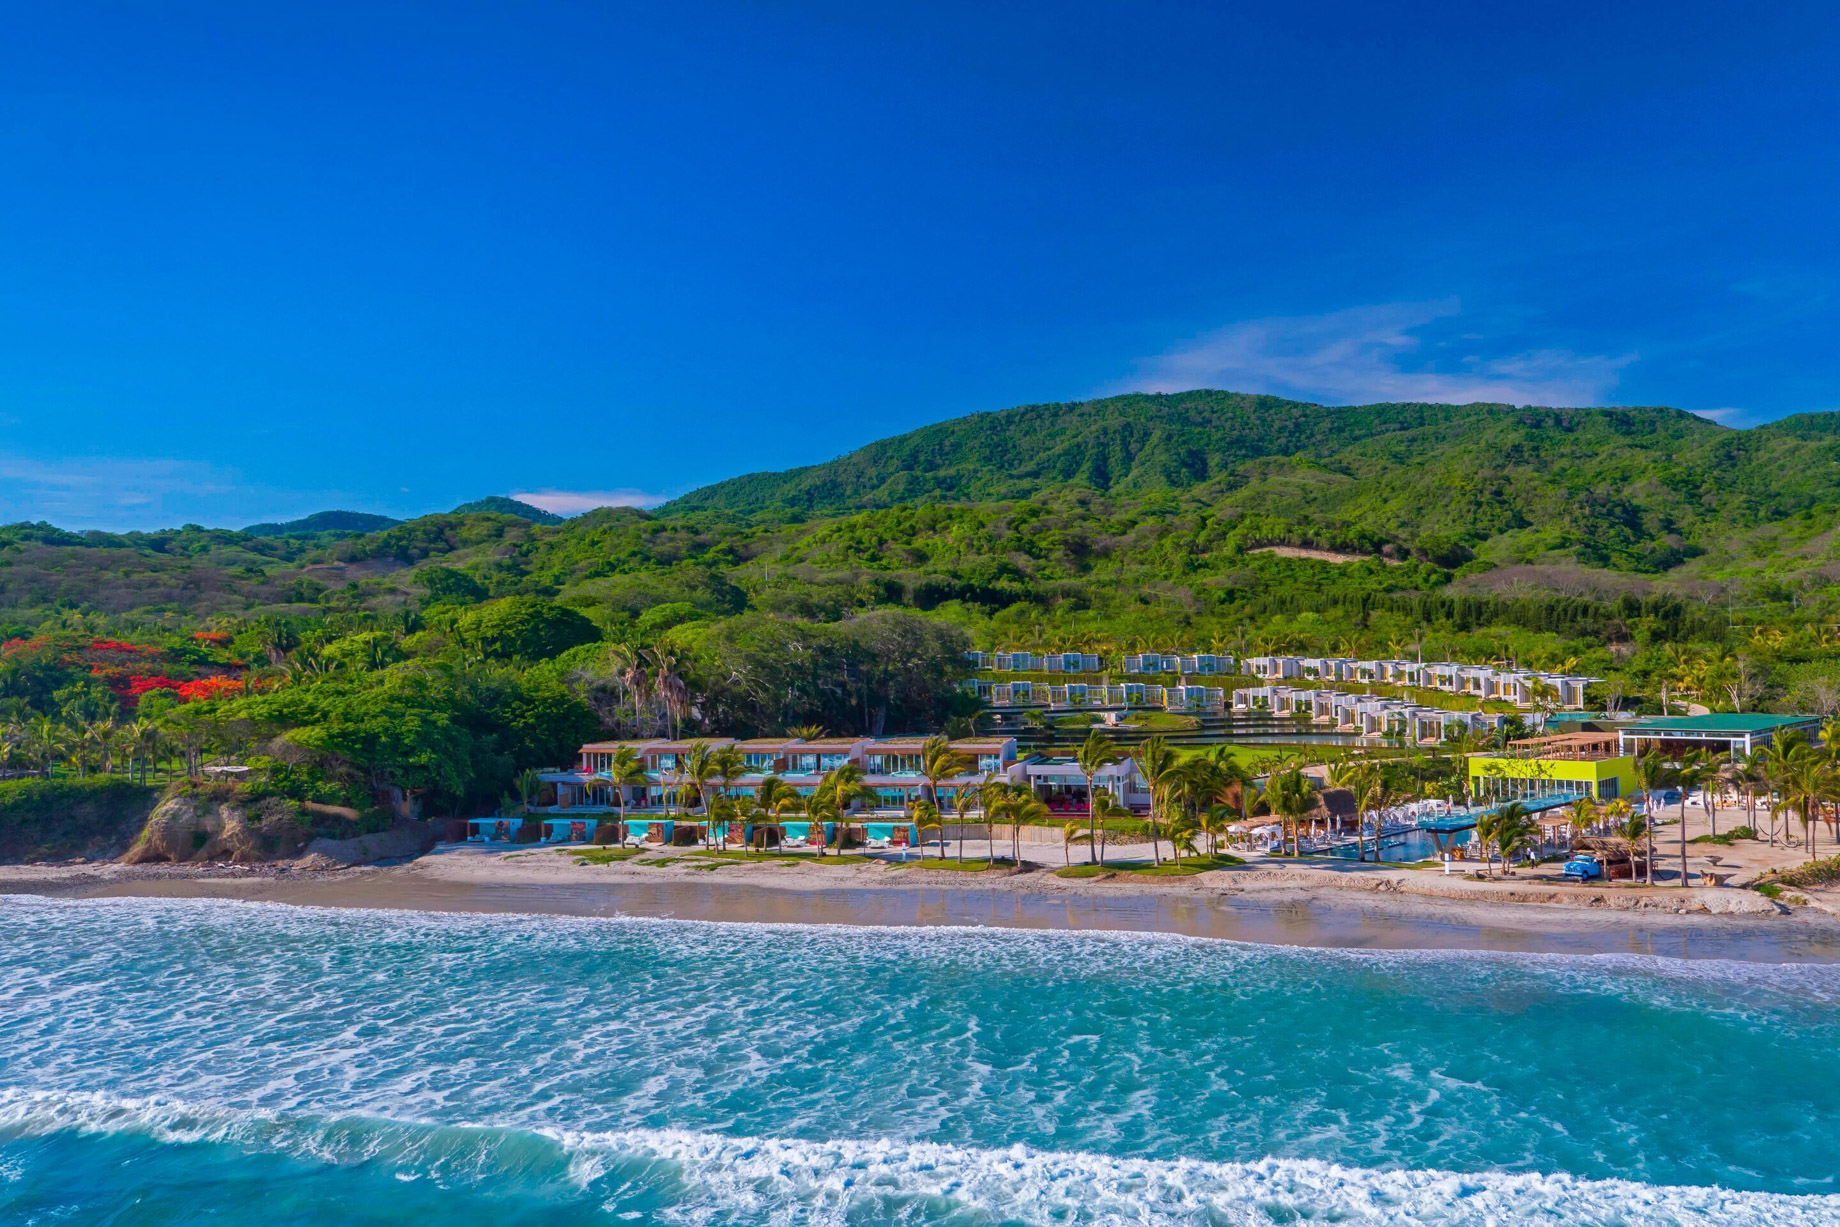 W Punta de Mita Luxury Resort - Punta De Mita, Mexico - W Punta de Mita Resort